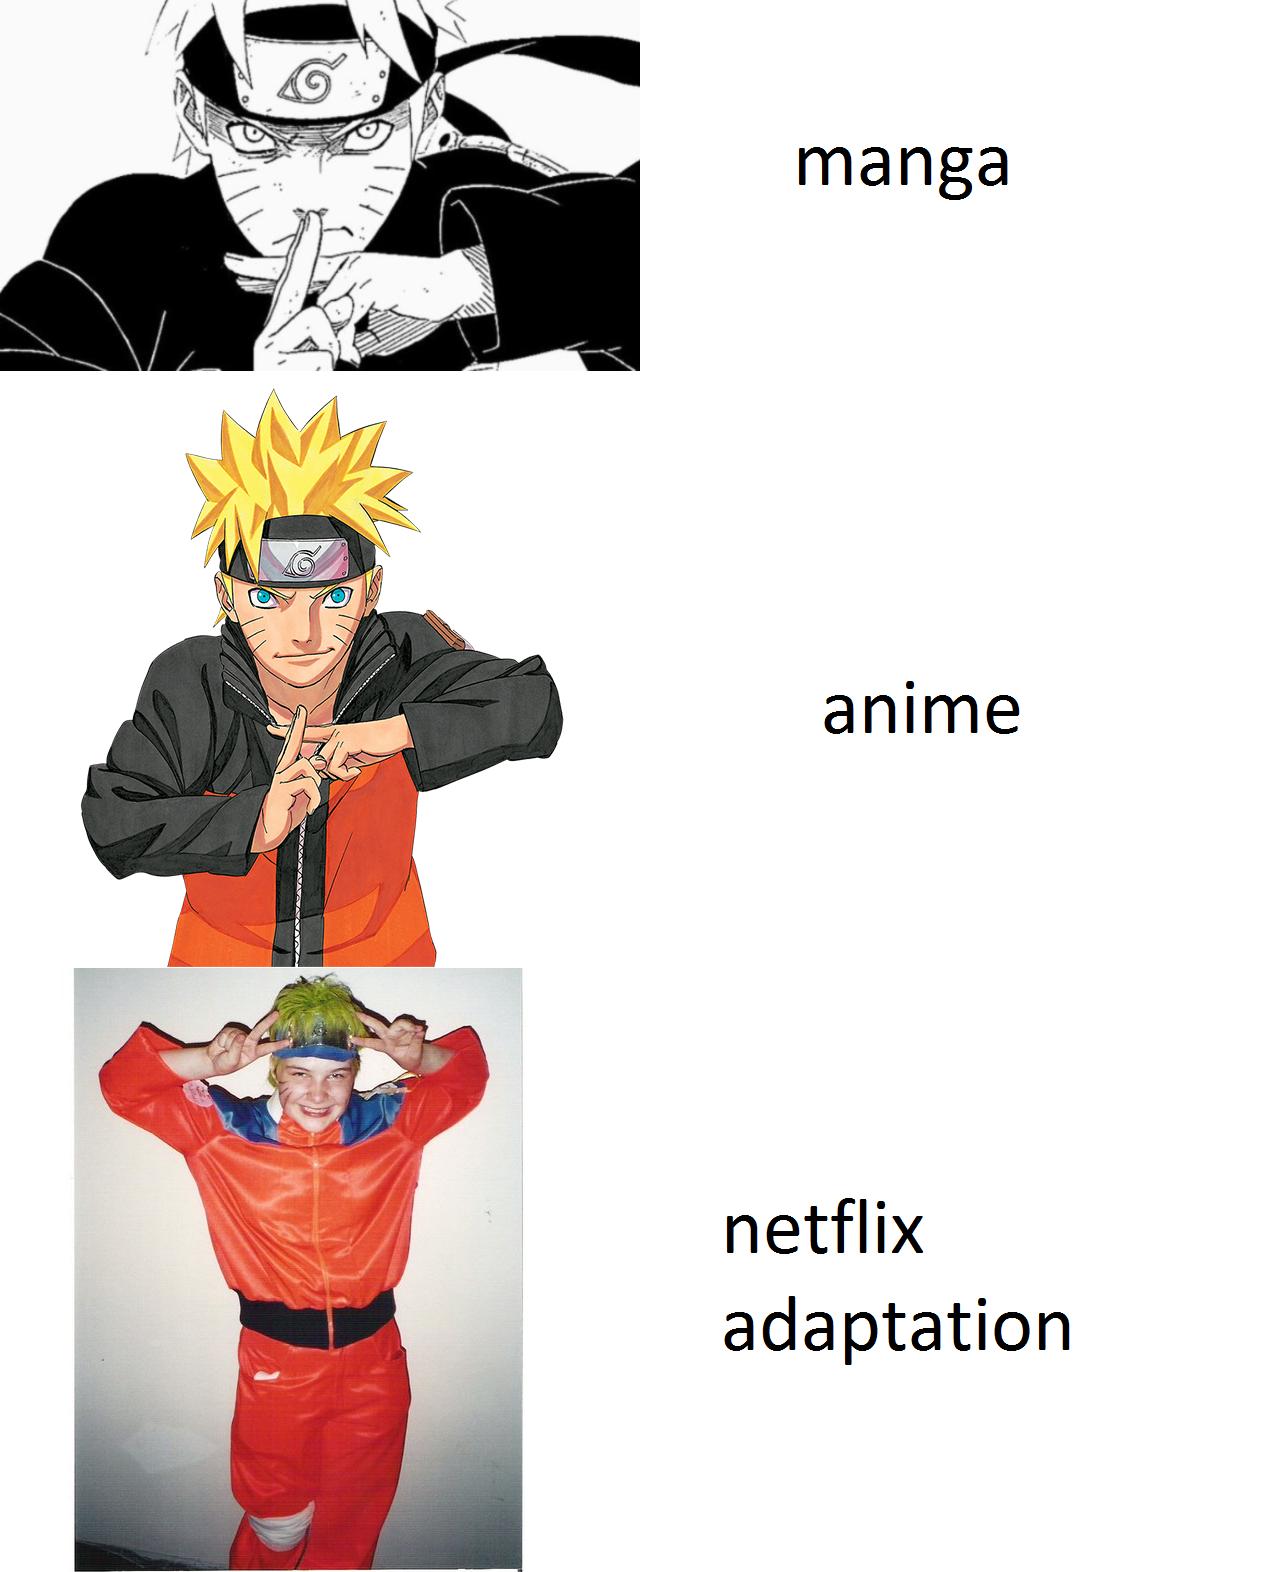 Nardo Netflix Adaptation Know Your Meme